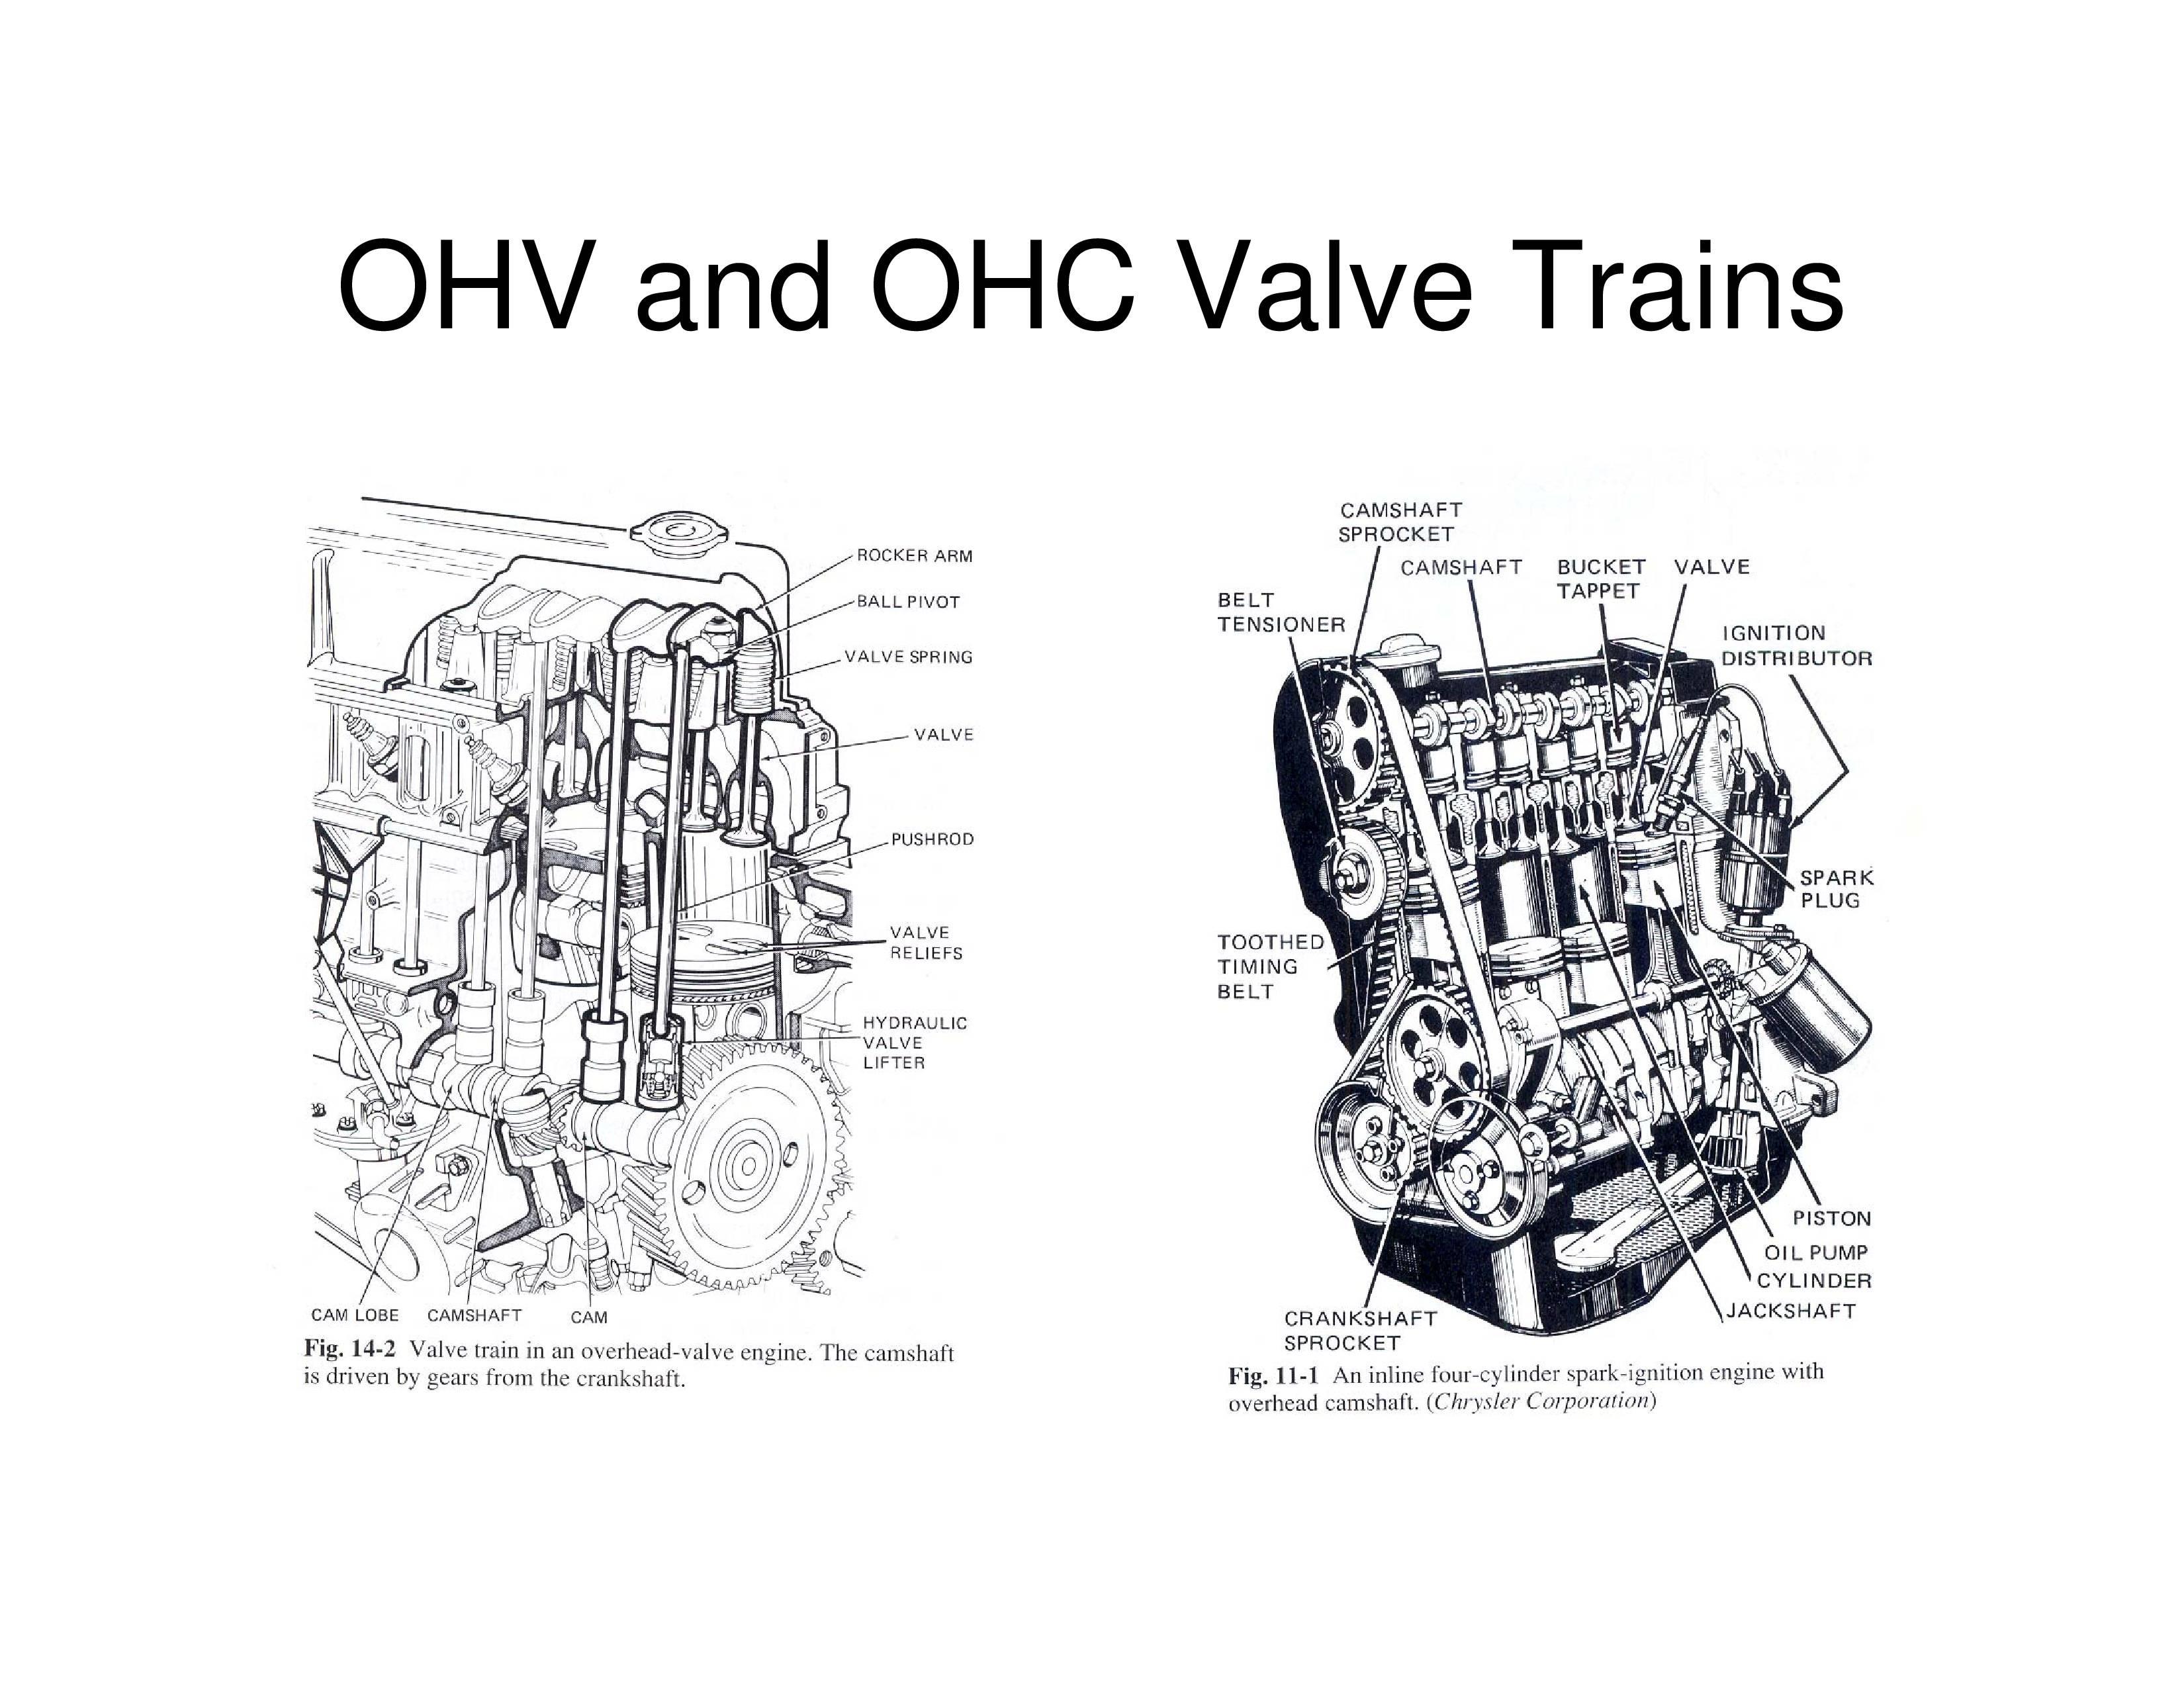 Engine Valve Train Diagram Automobile Engineering 4 Stroke Cycle Notes Of Engine Valve Train Diagram